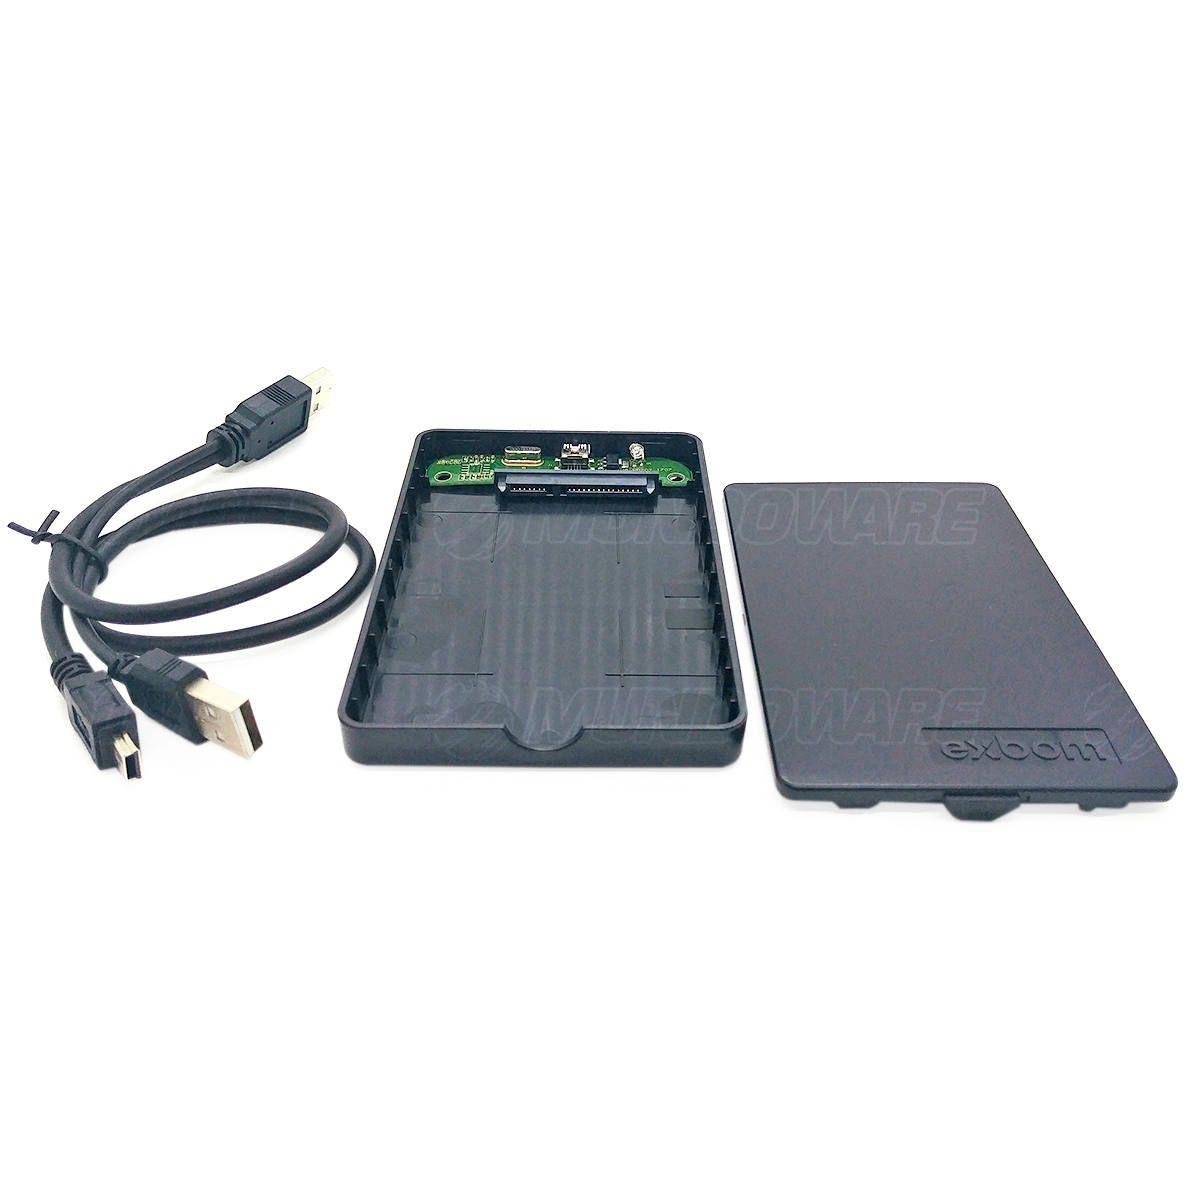 "Case para HD Externo SATA II 2.5"" USB 2.0 em ABS Exbom CGHD-20 Preto"